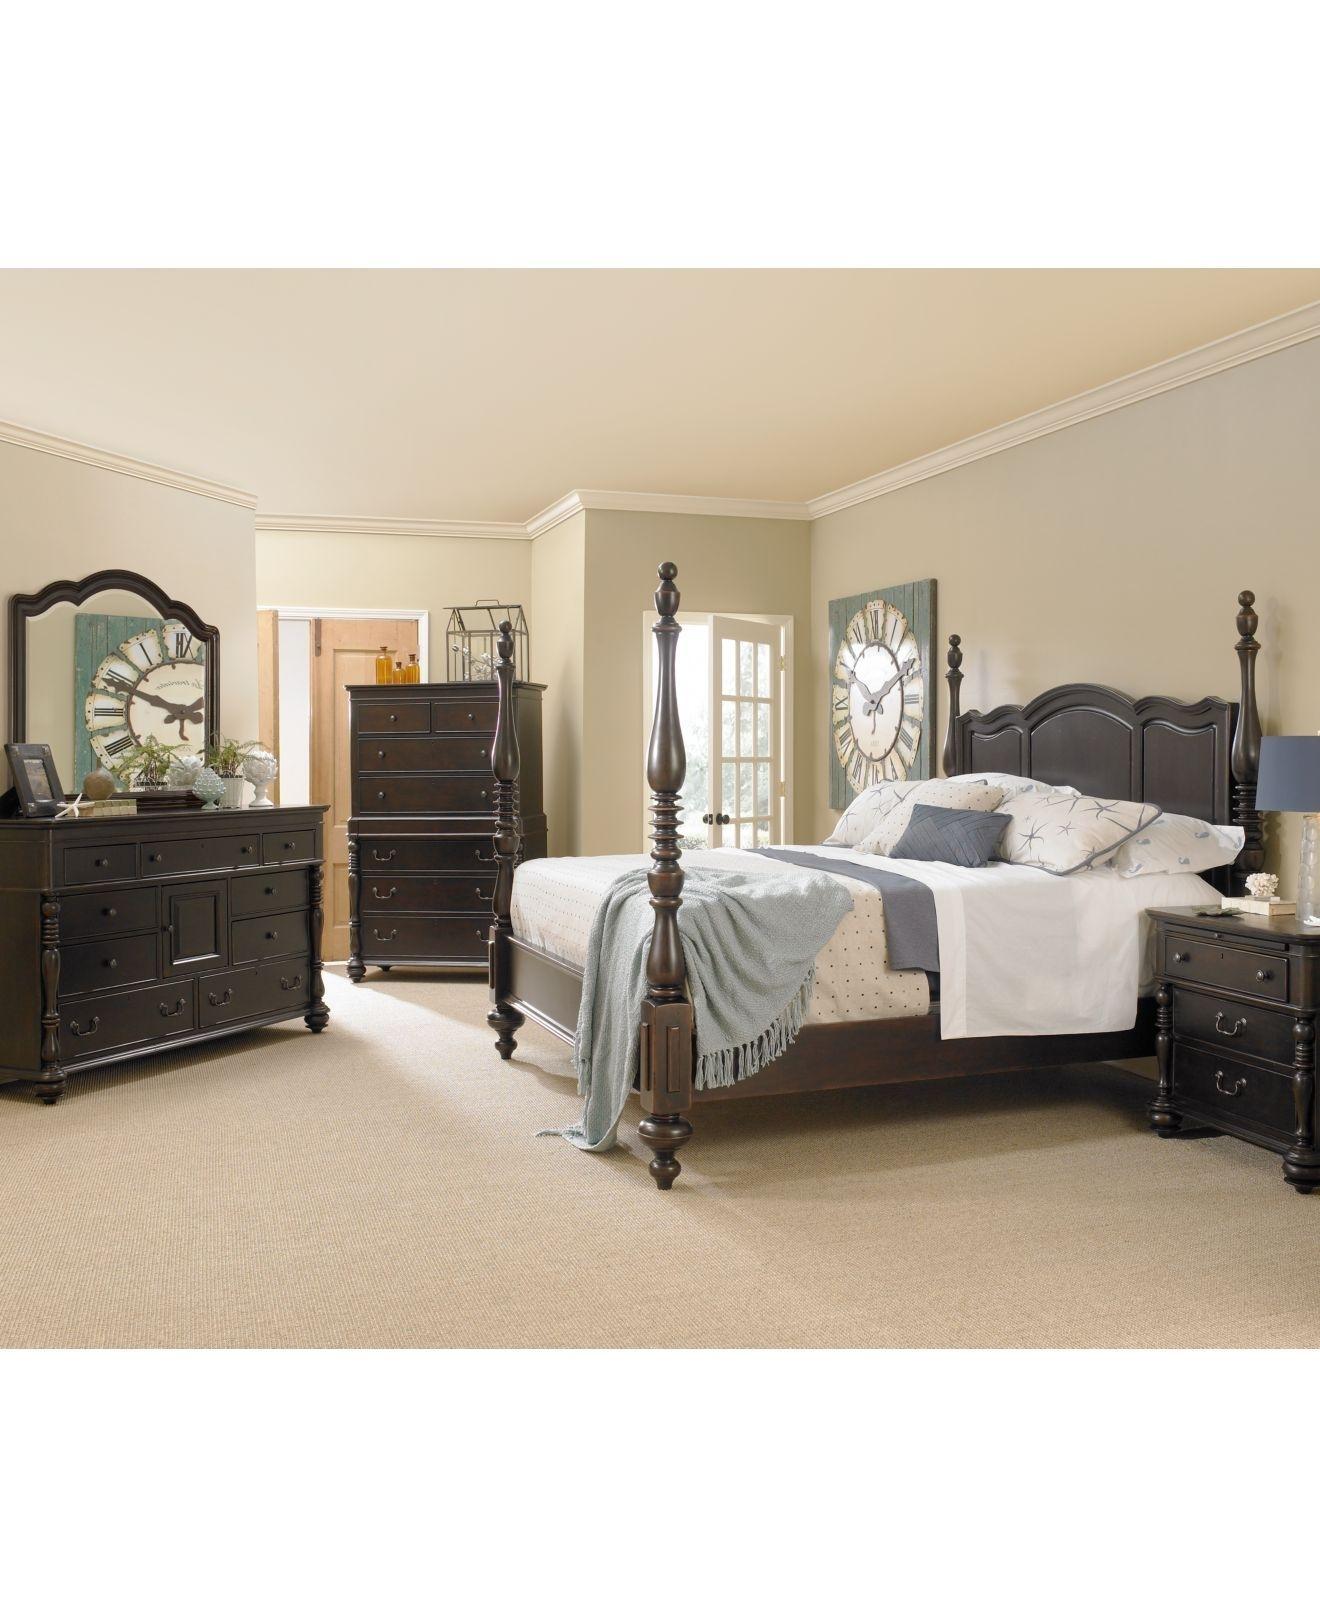 Image of: Paula Deen Savannah Bed Ideas On Foter